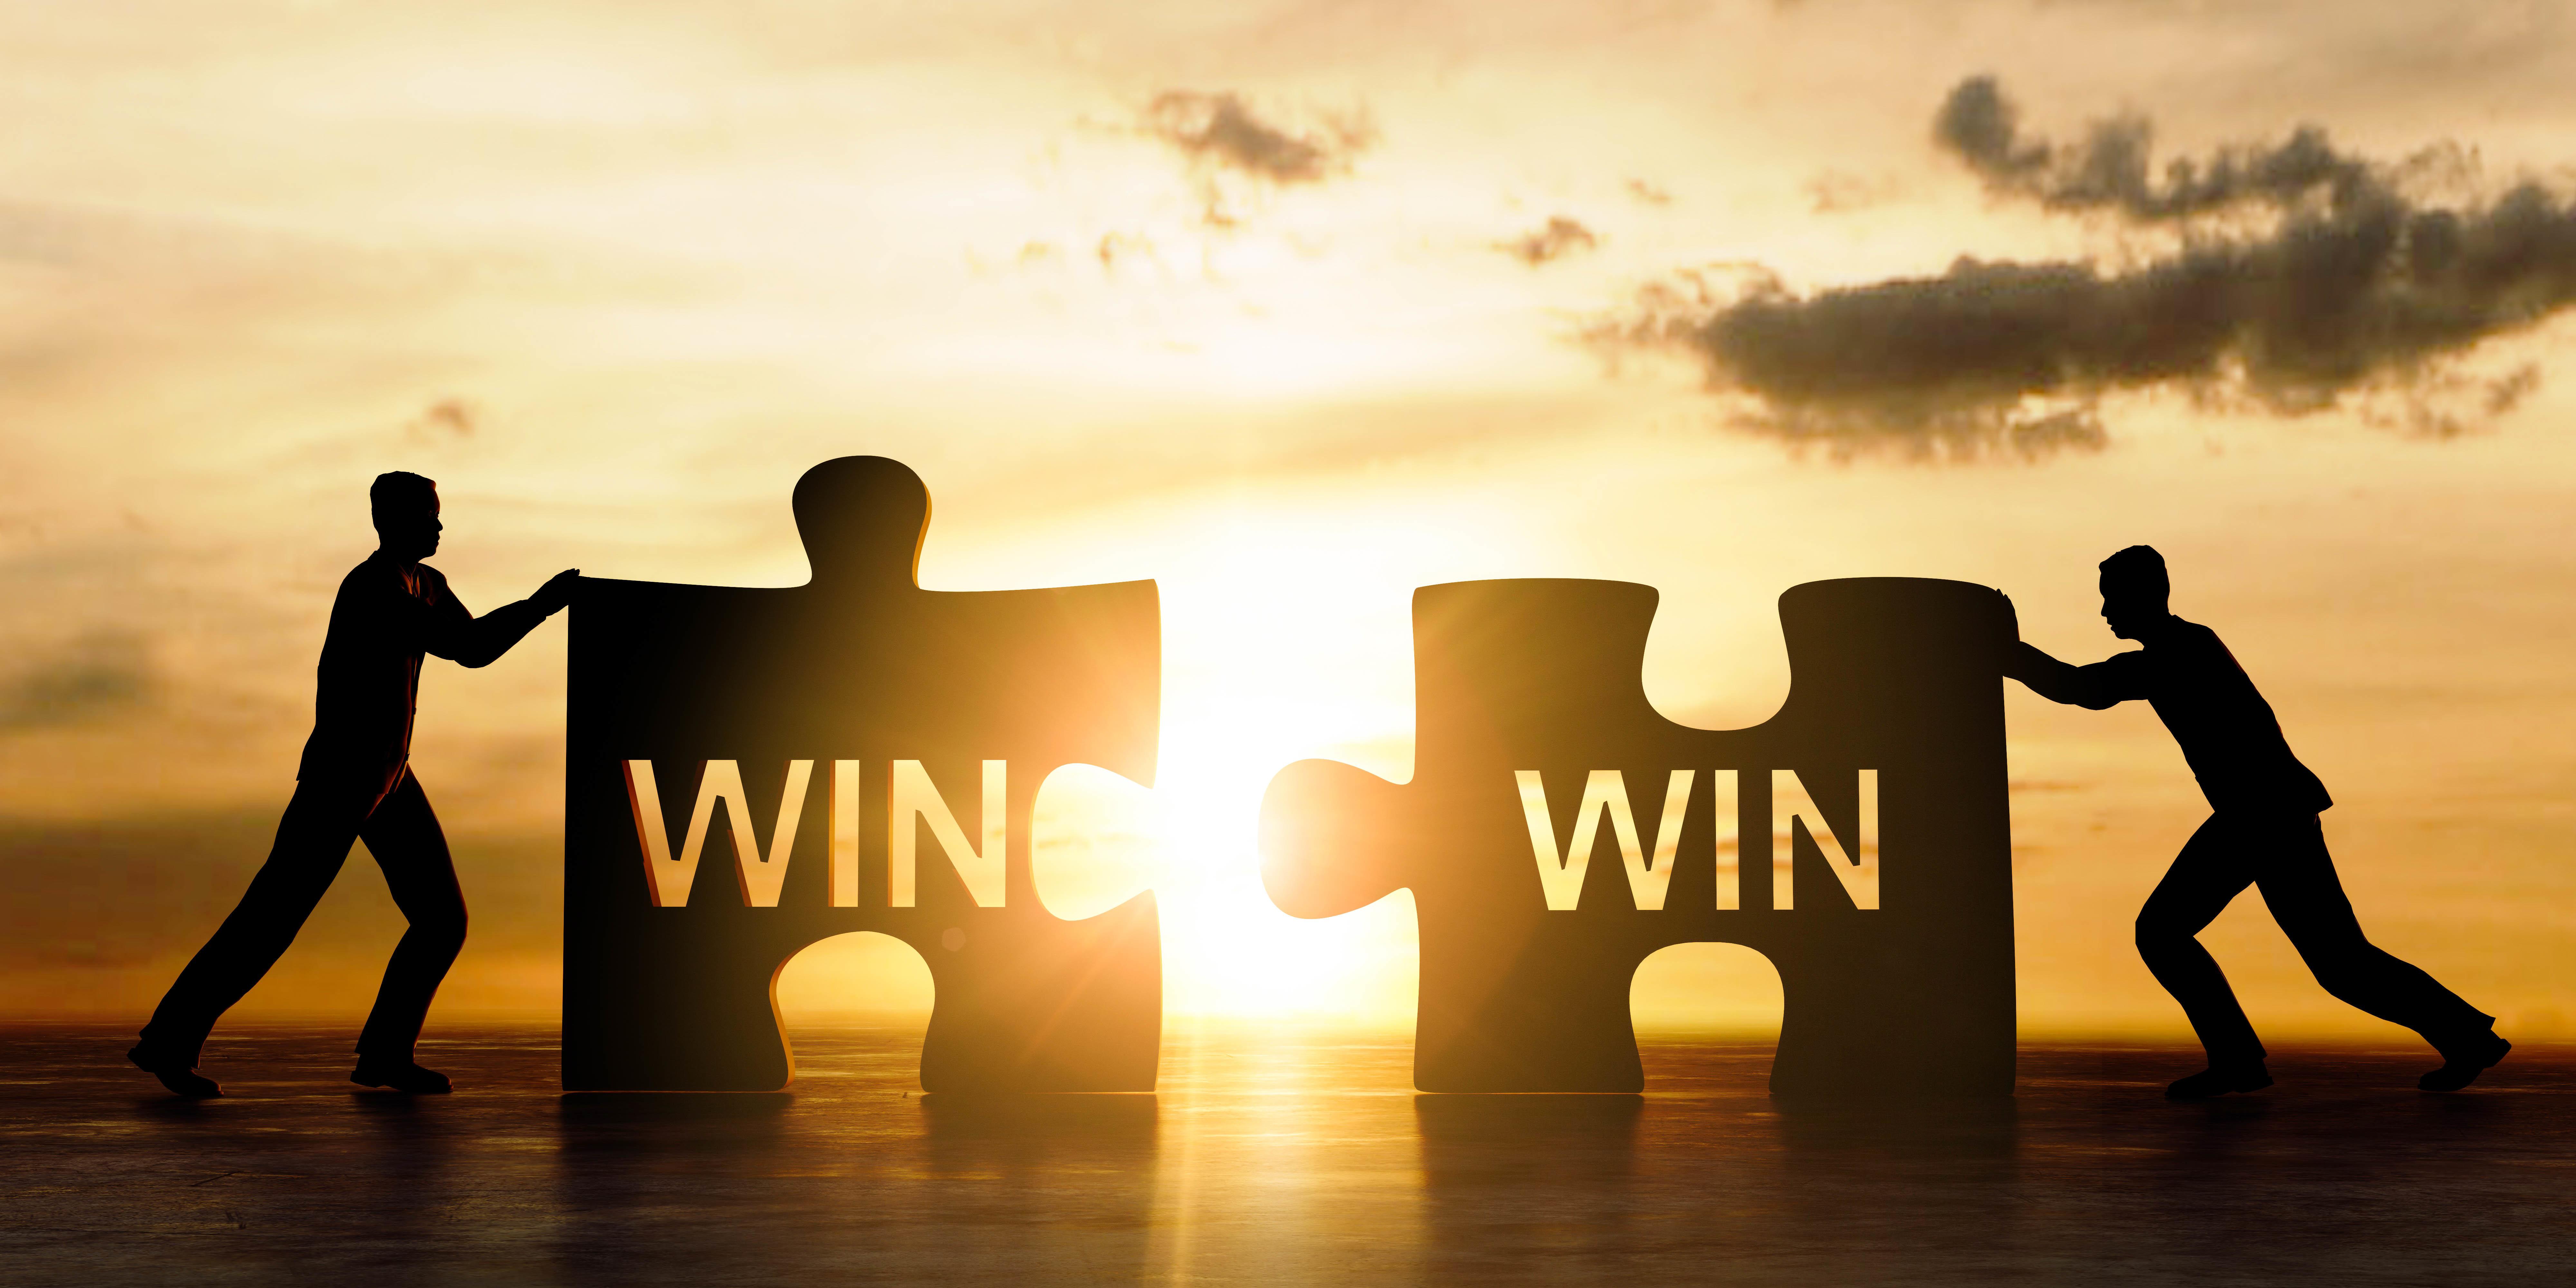 Win-Win_AdobeStock_181004052